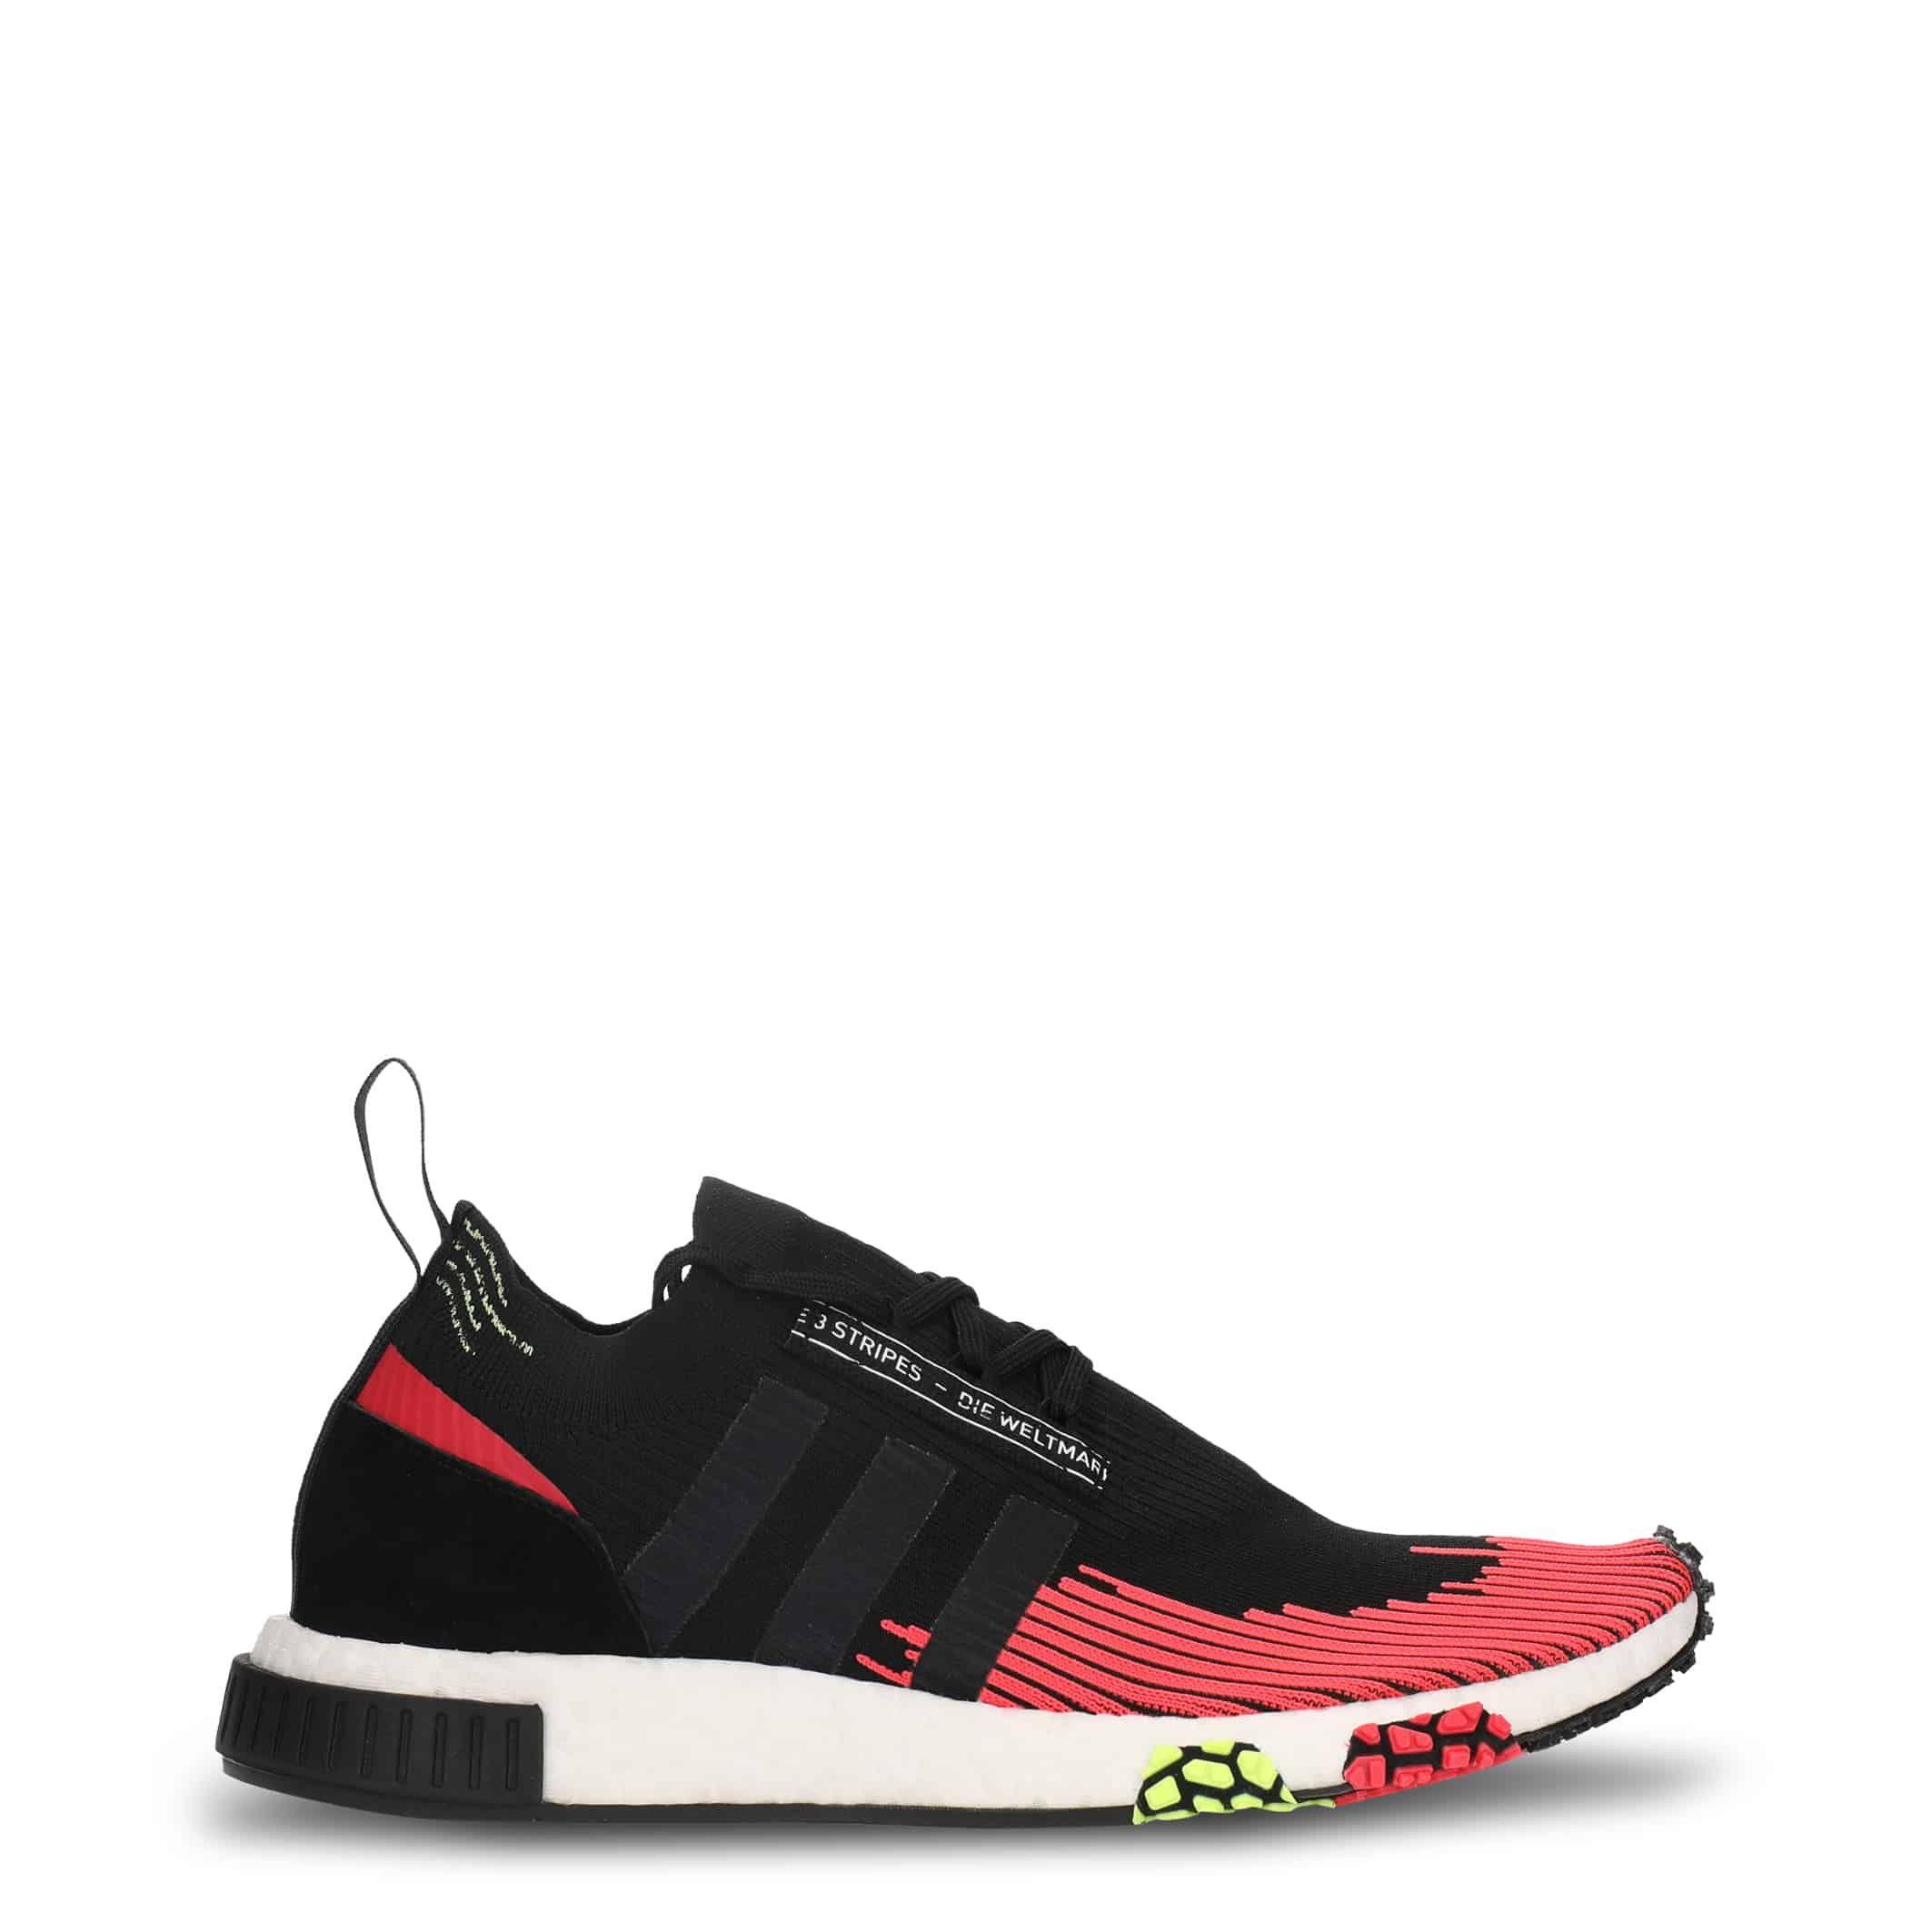 Schuhe Adidas – NMD-RACER